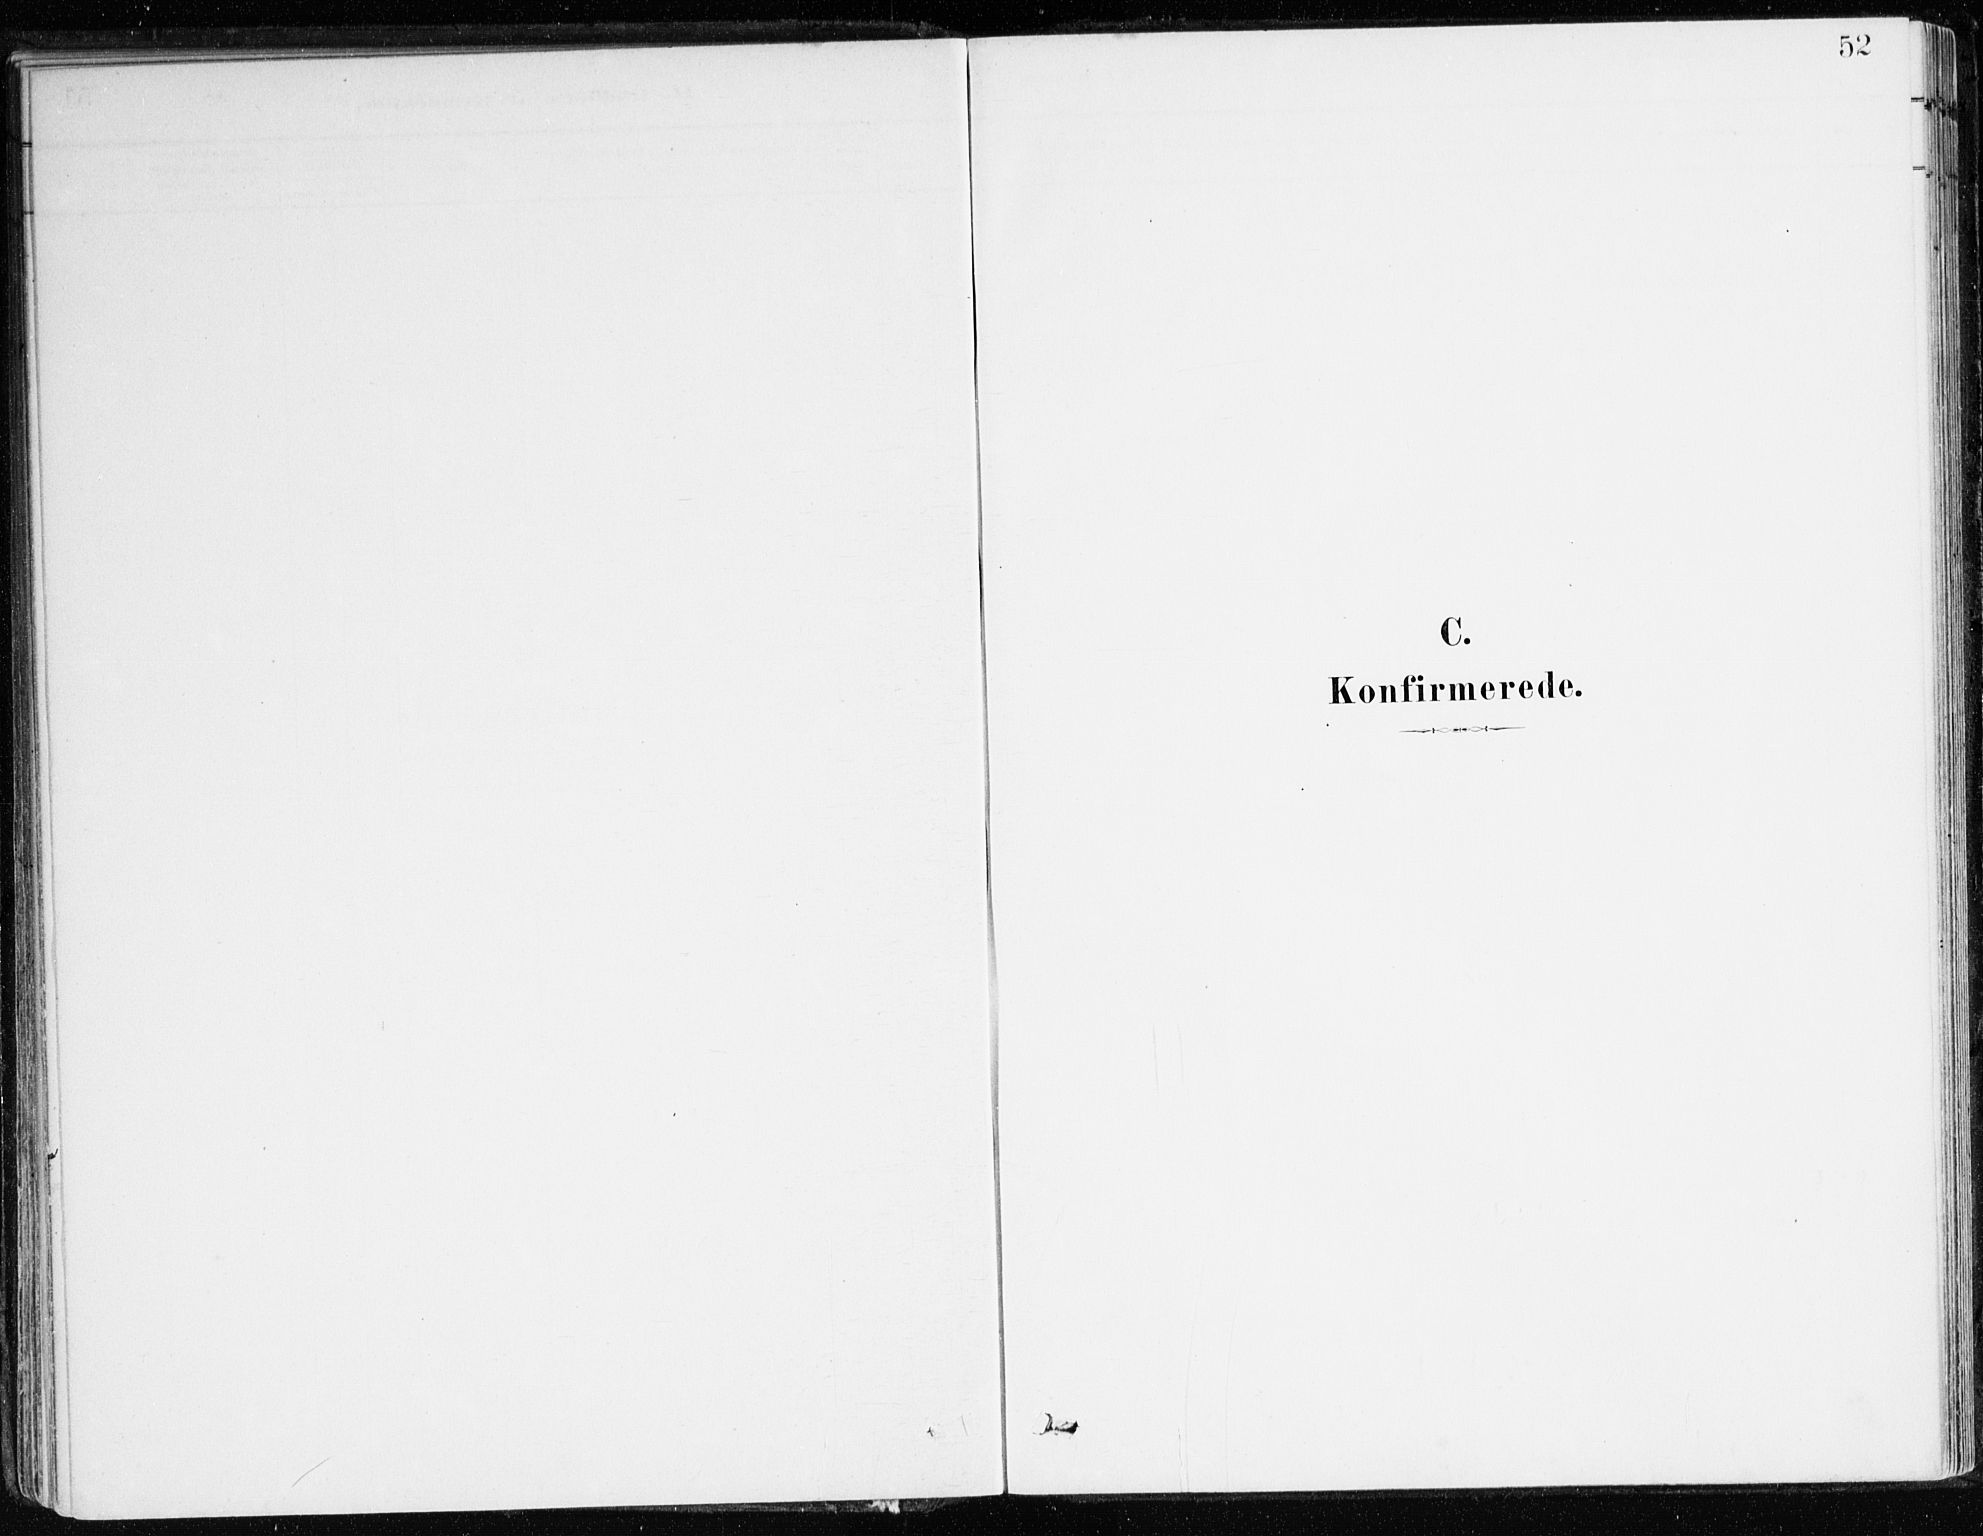 SAB, Aurland Sokneprestembete*, Ministerialbok nr. C 1, 1880-1921, s. 52